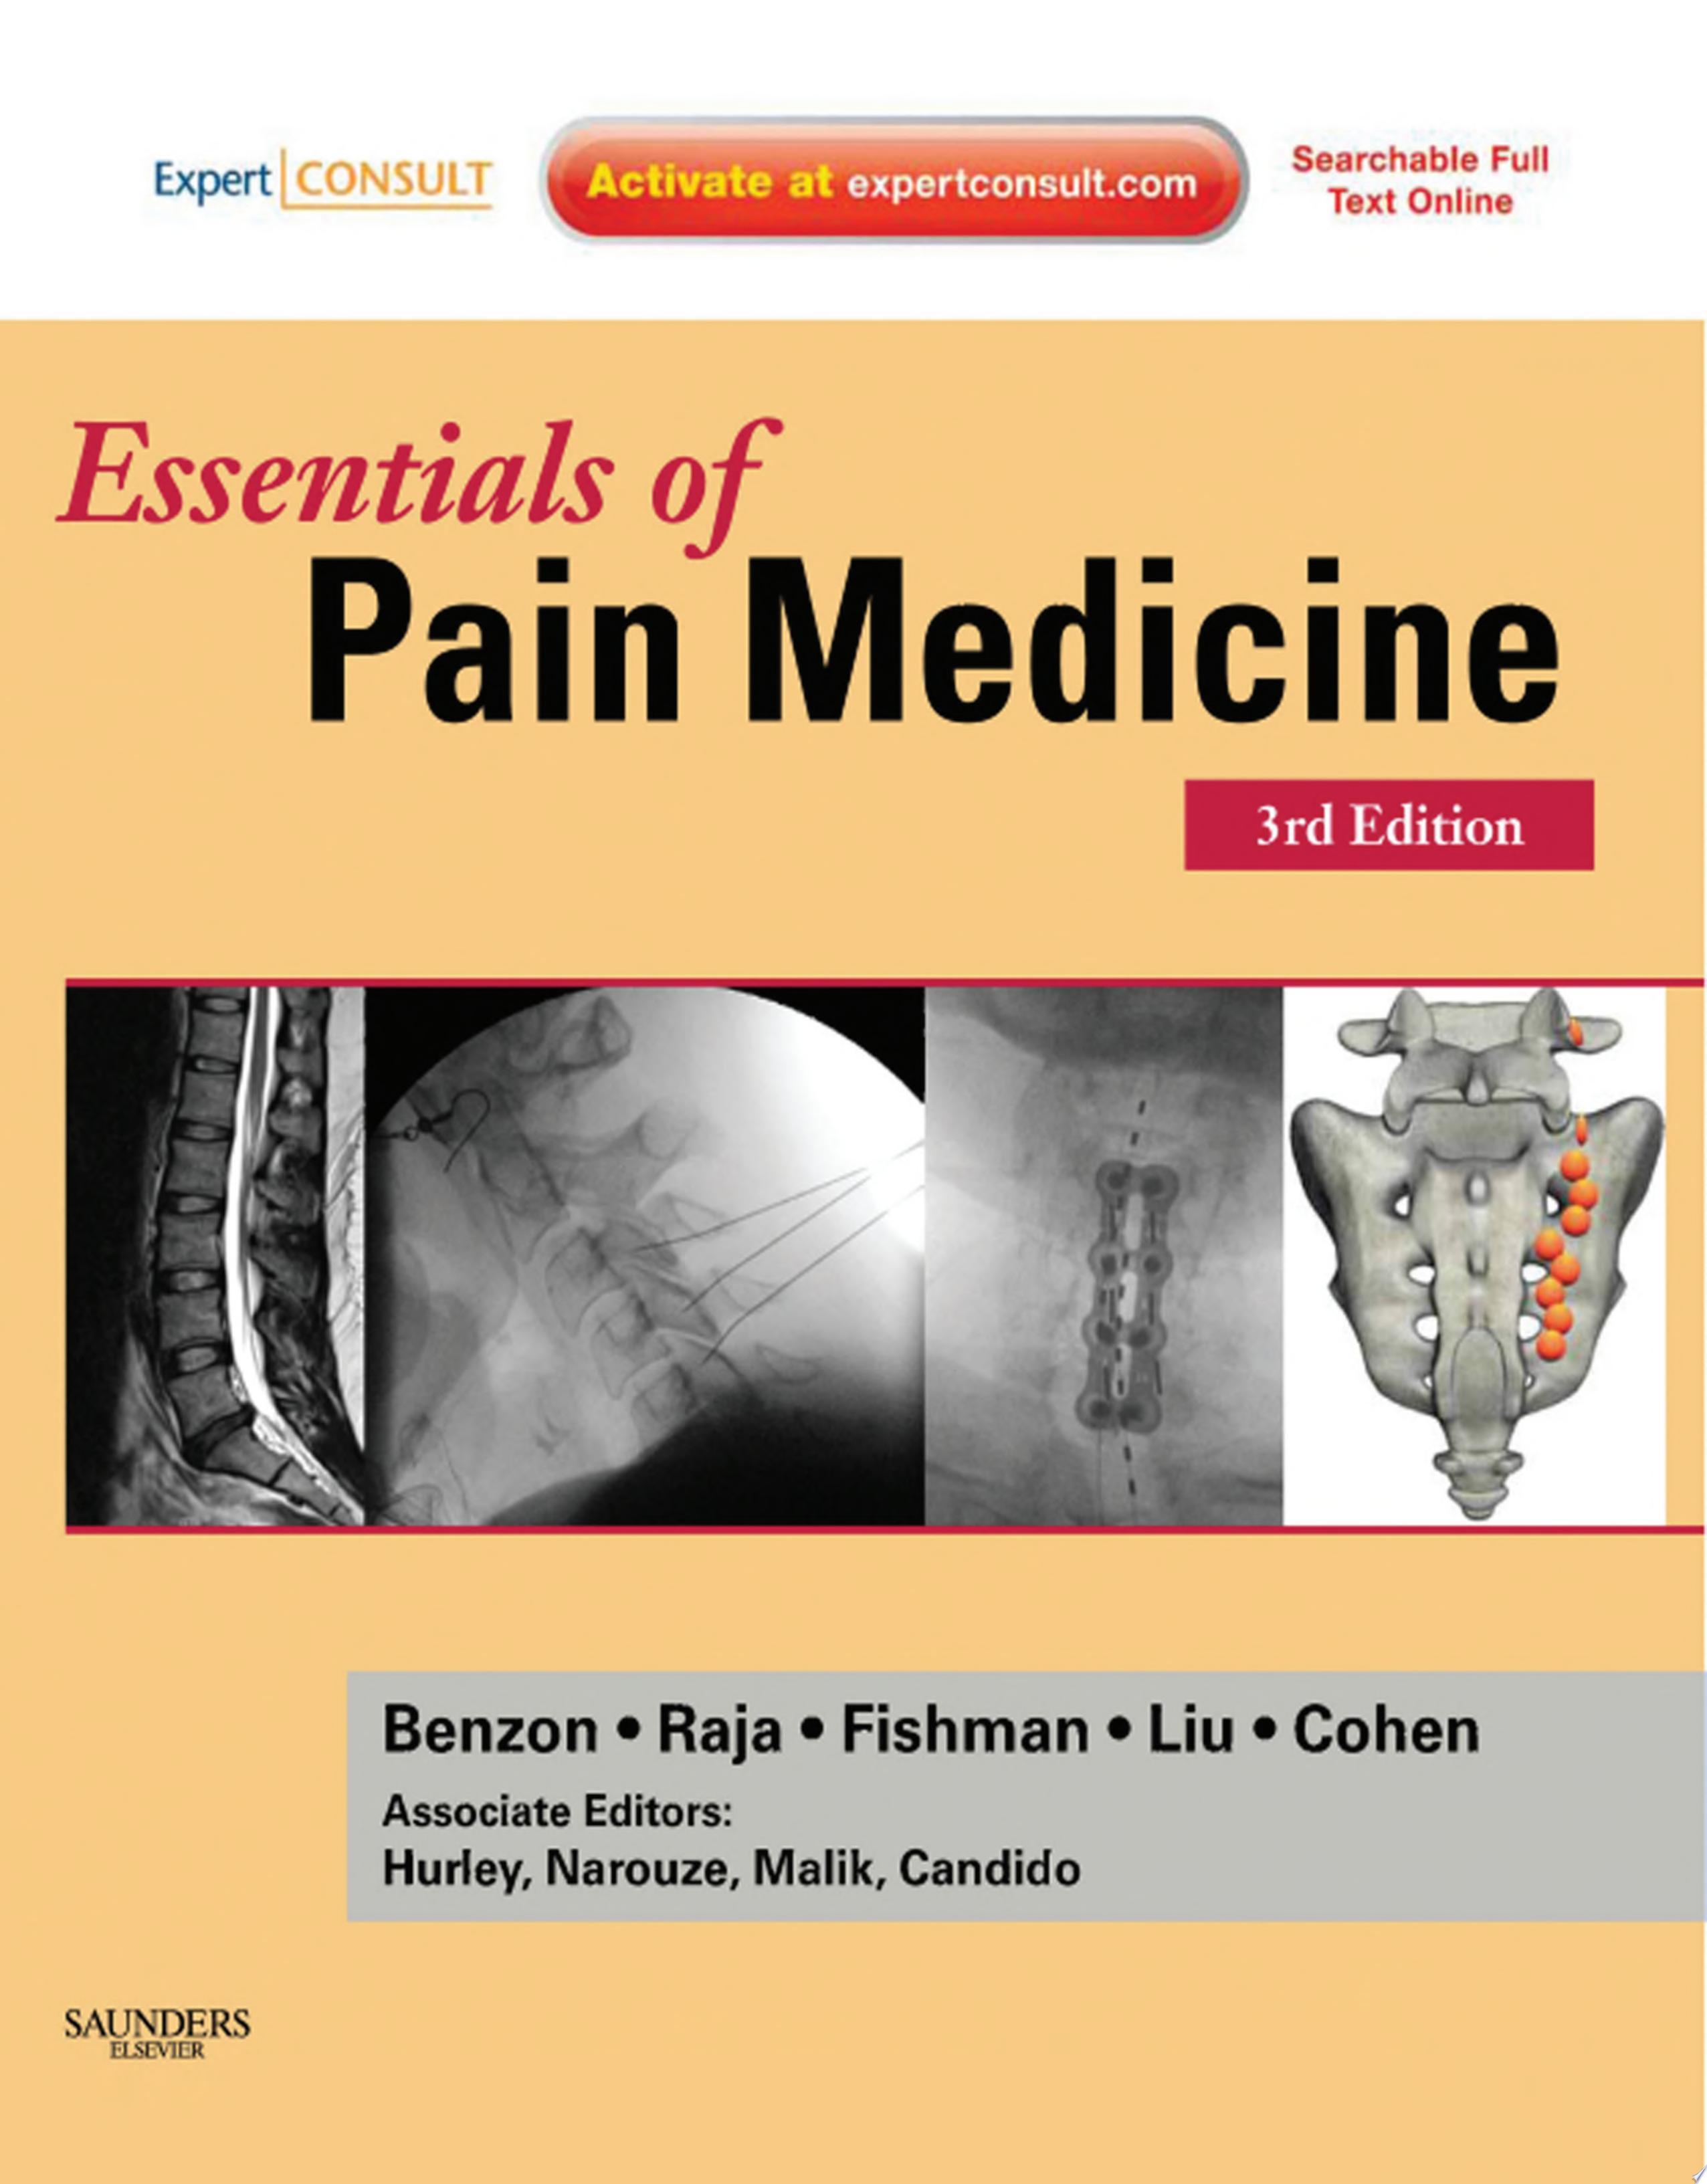 Essentials of Pain Medicine E book